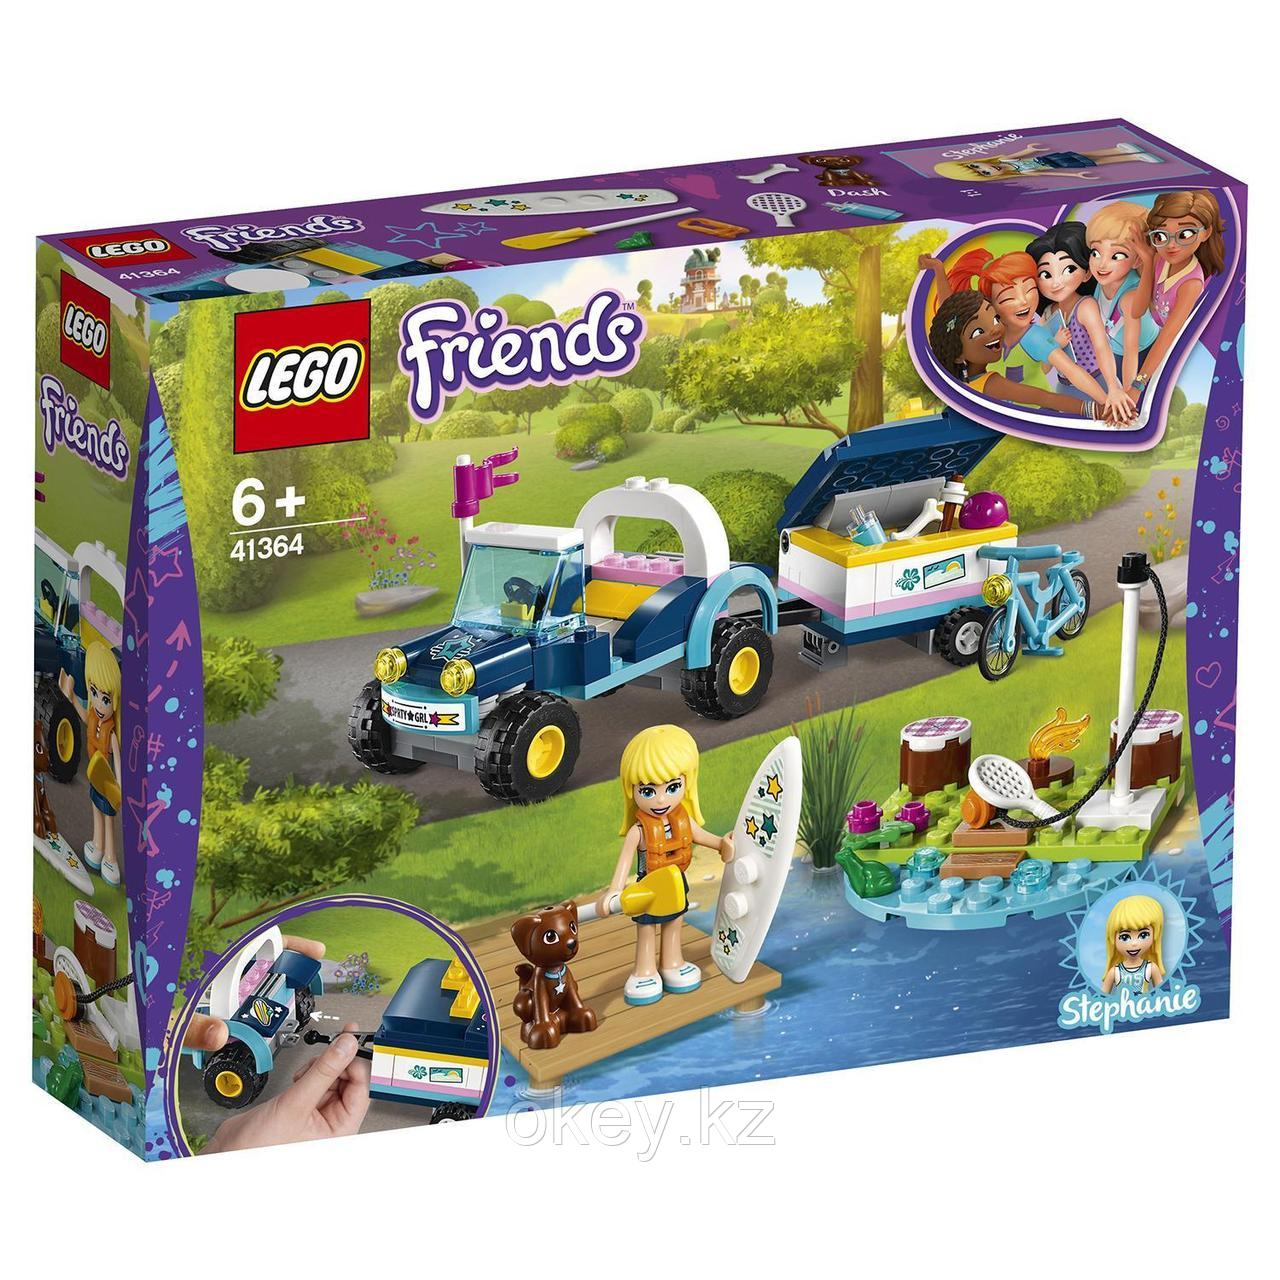 LEGO Friends: Багги с прицепом Стефани 41364